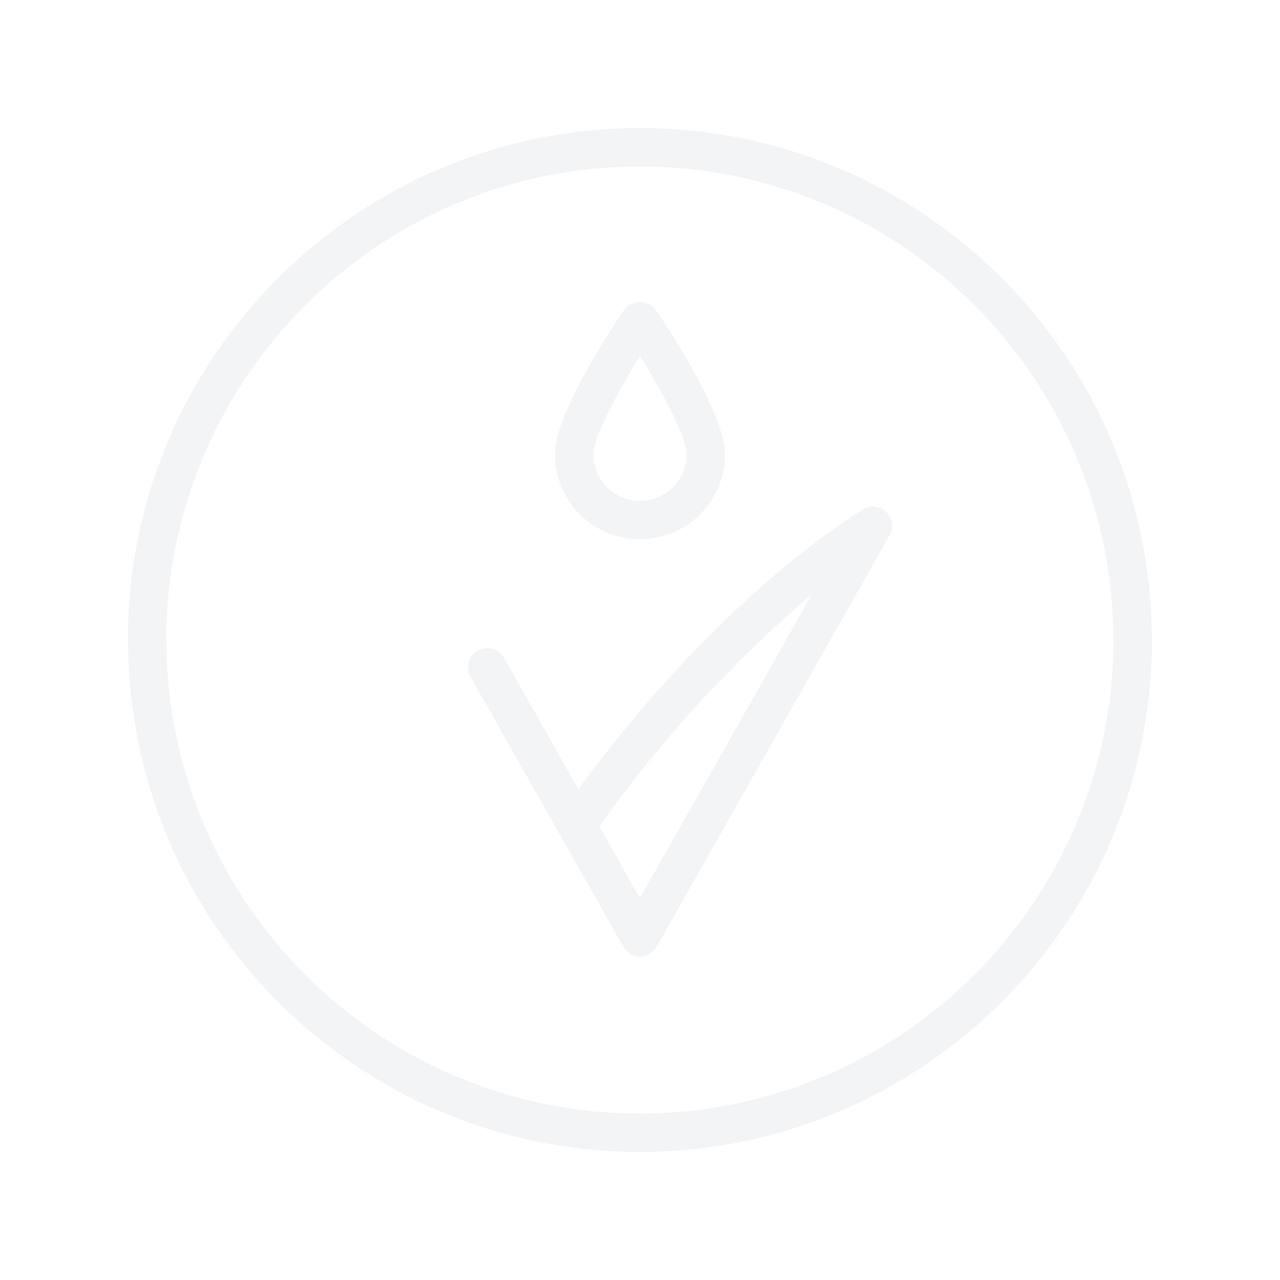 MIZON Joyful Time Essence Herb Mask 23g